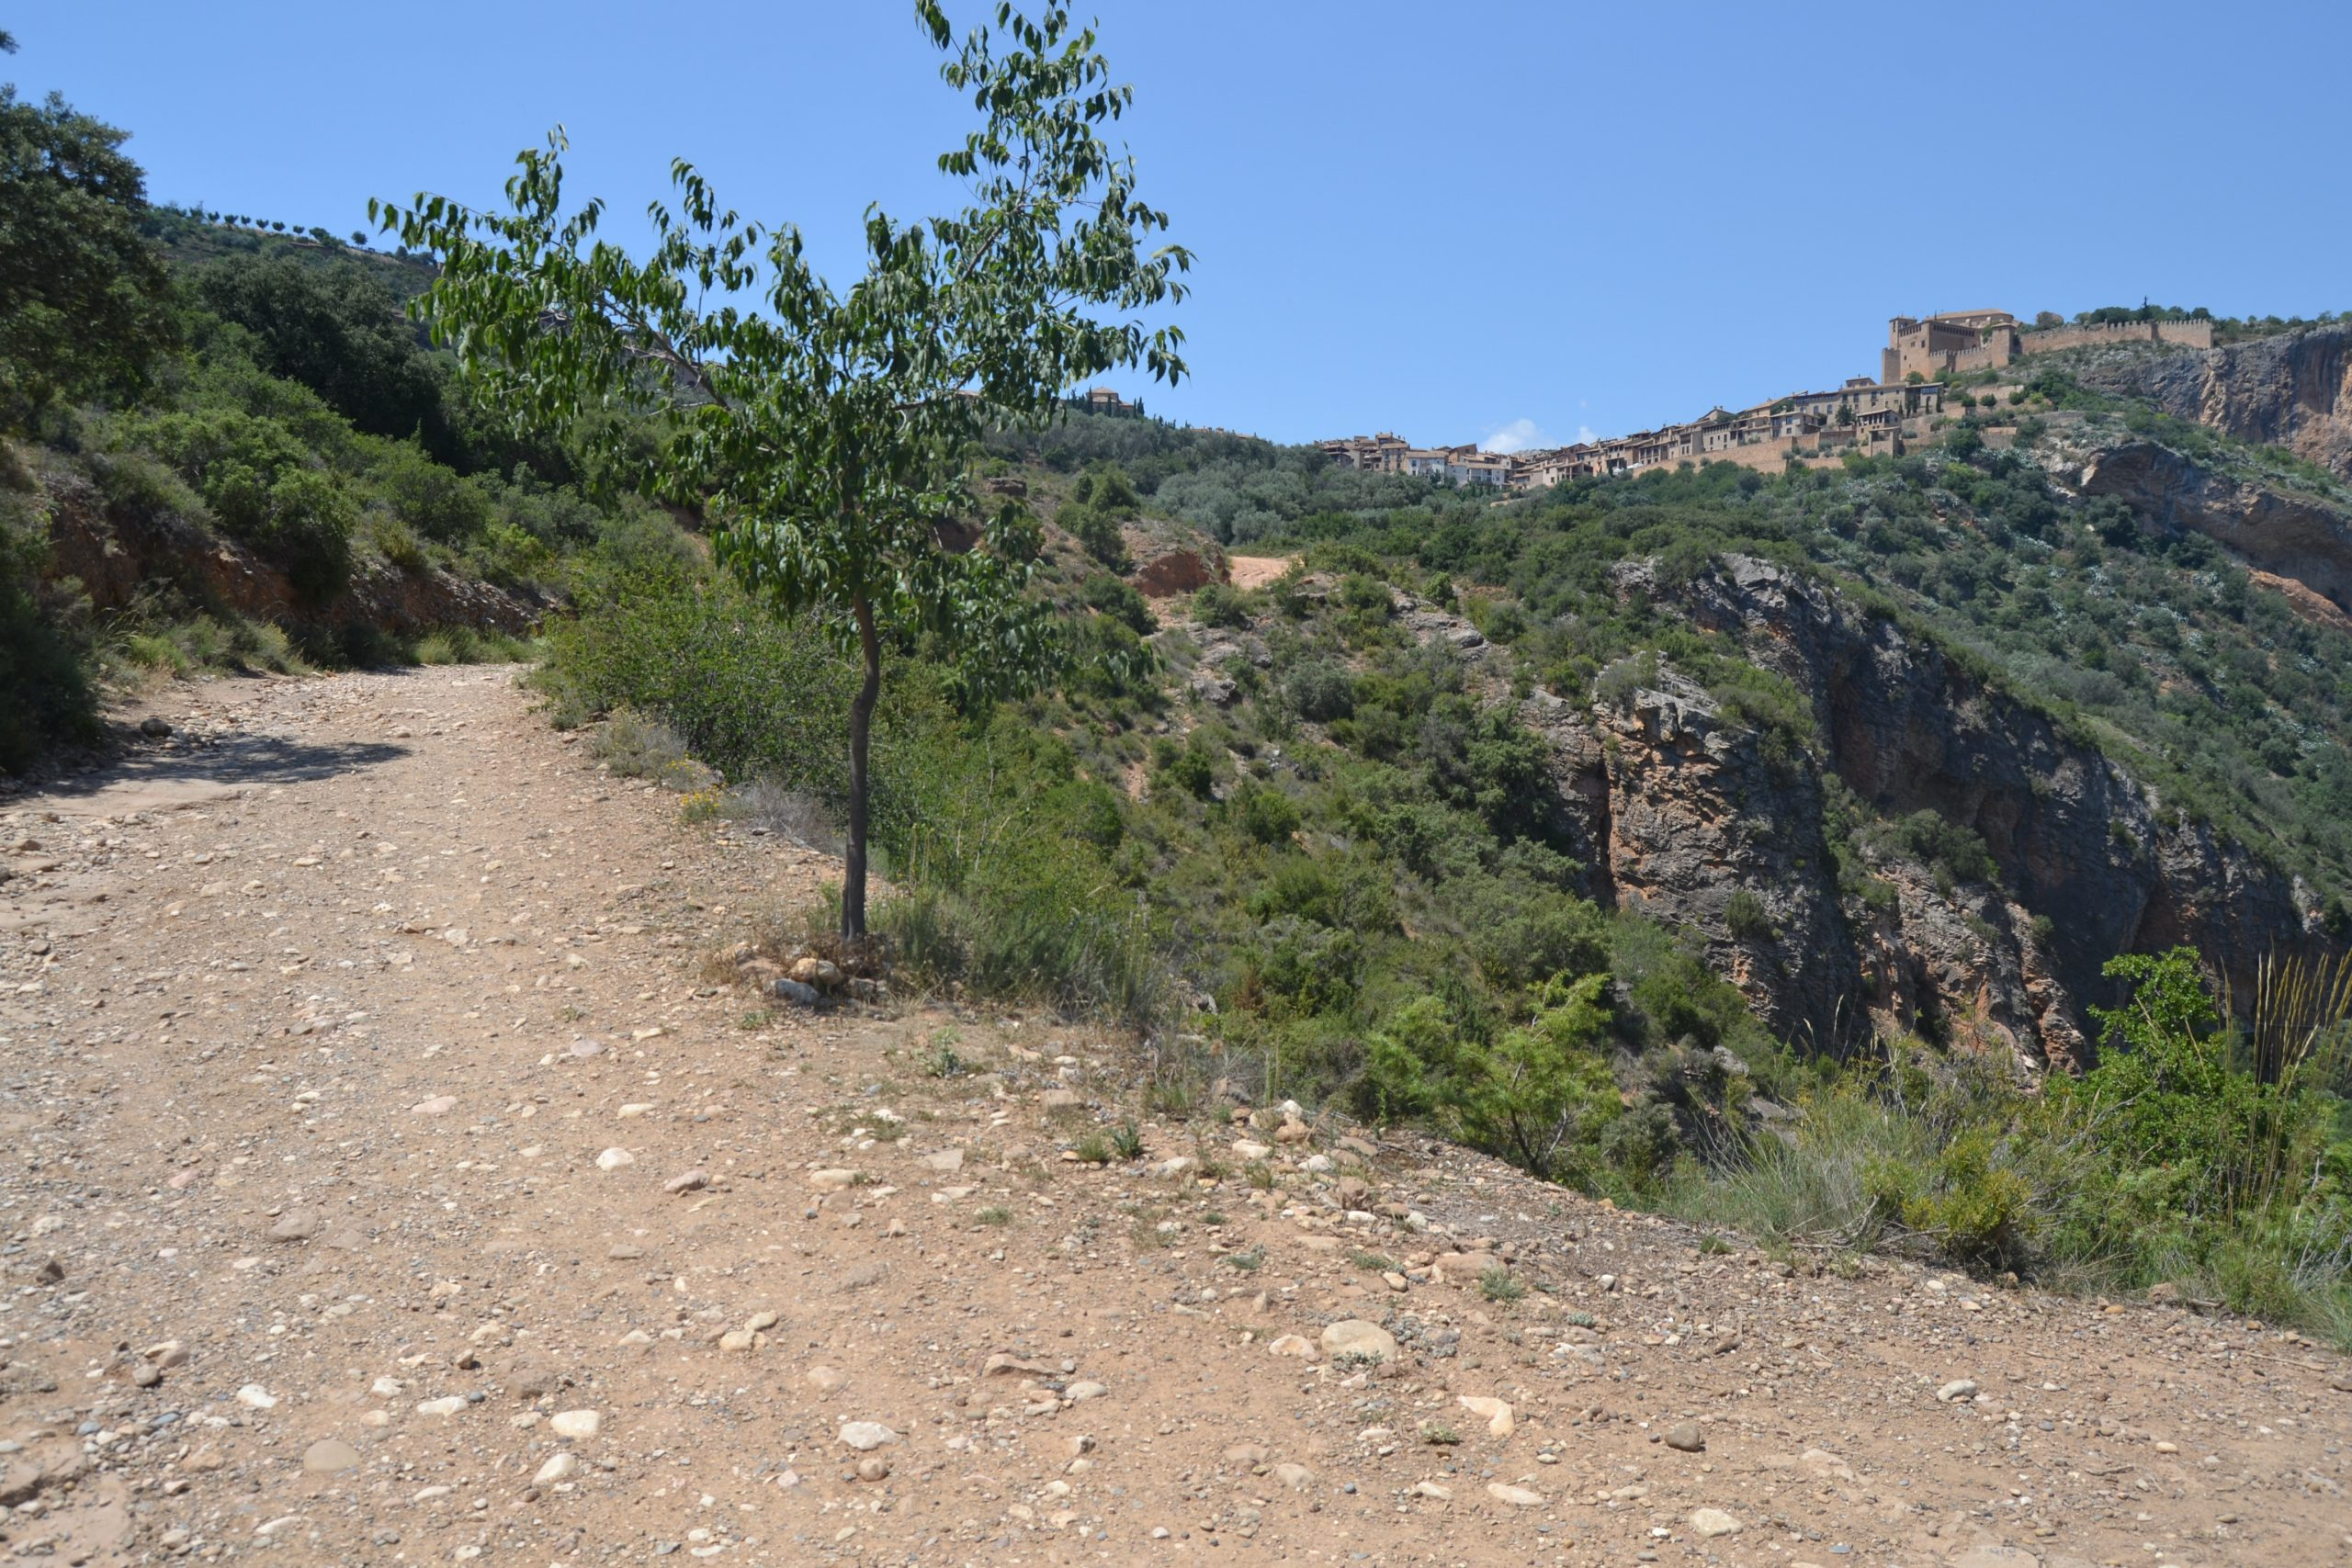 Camino Natural del Somontano